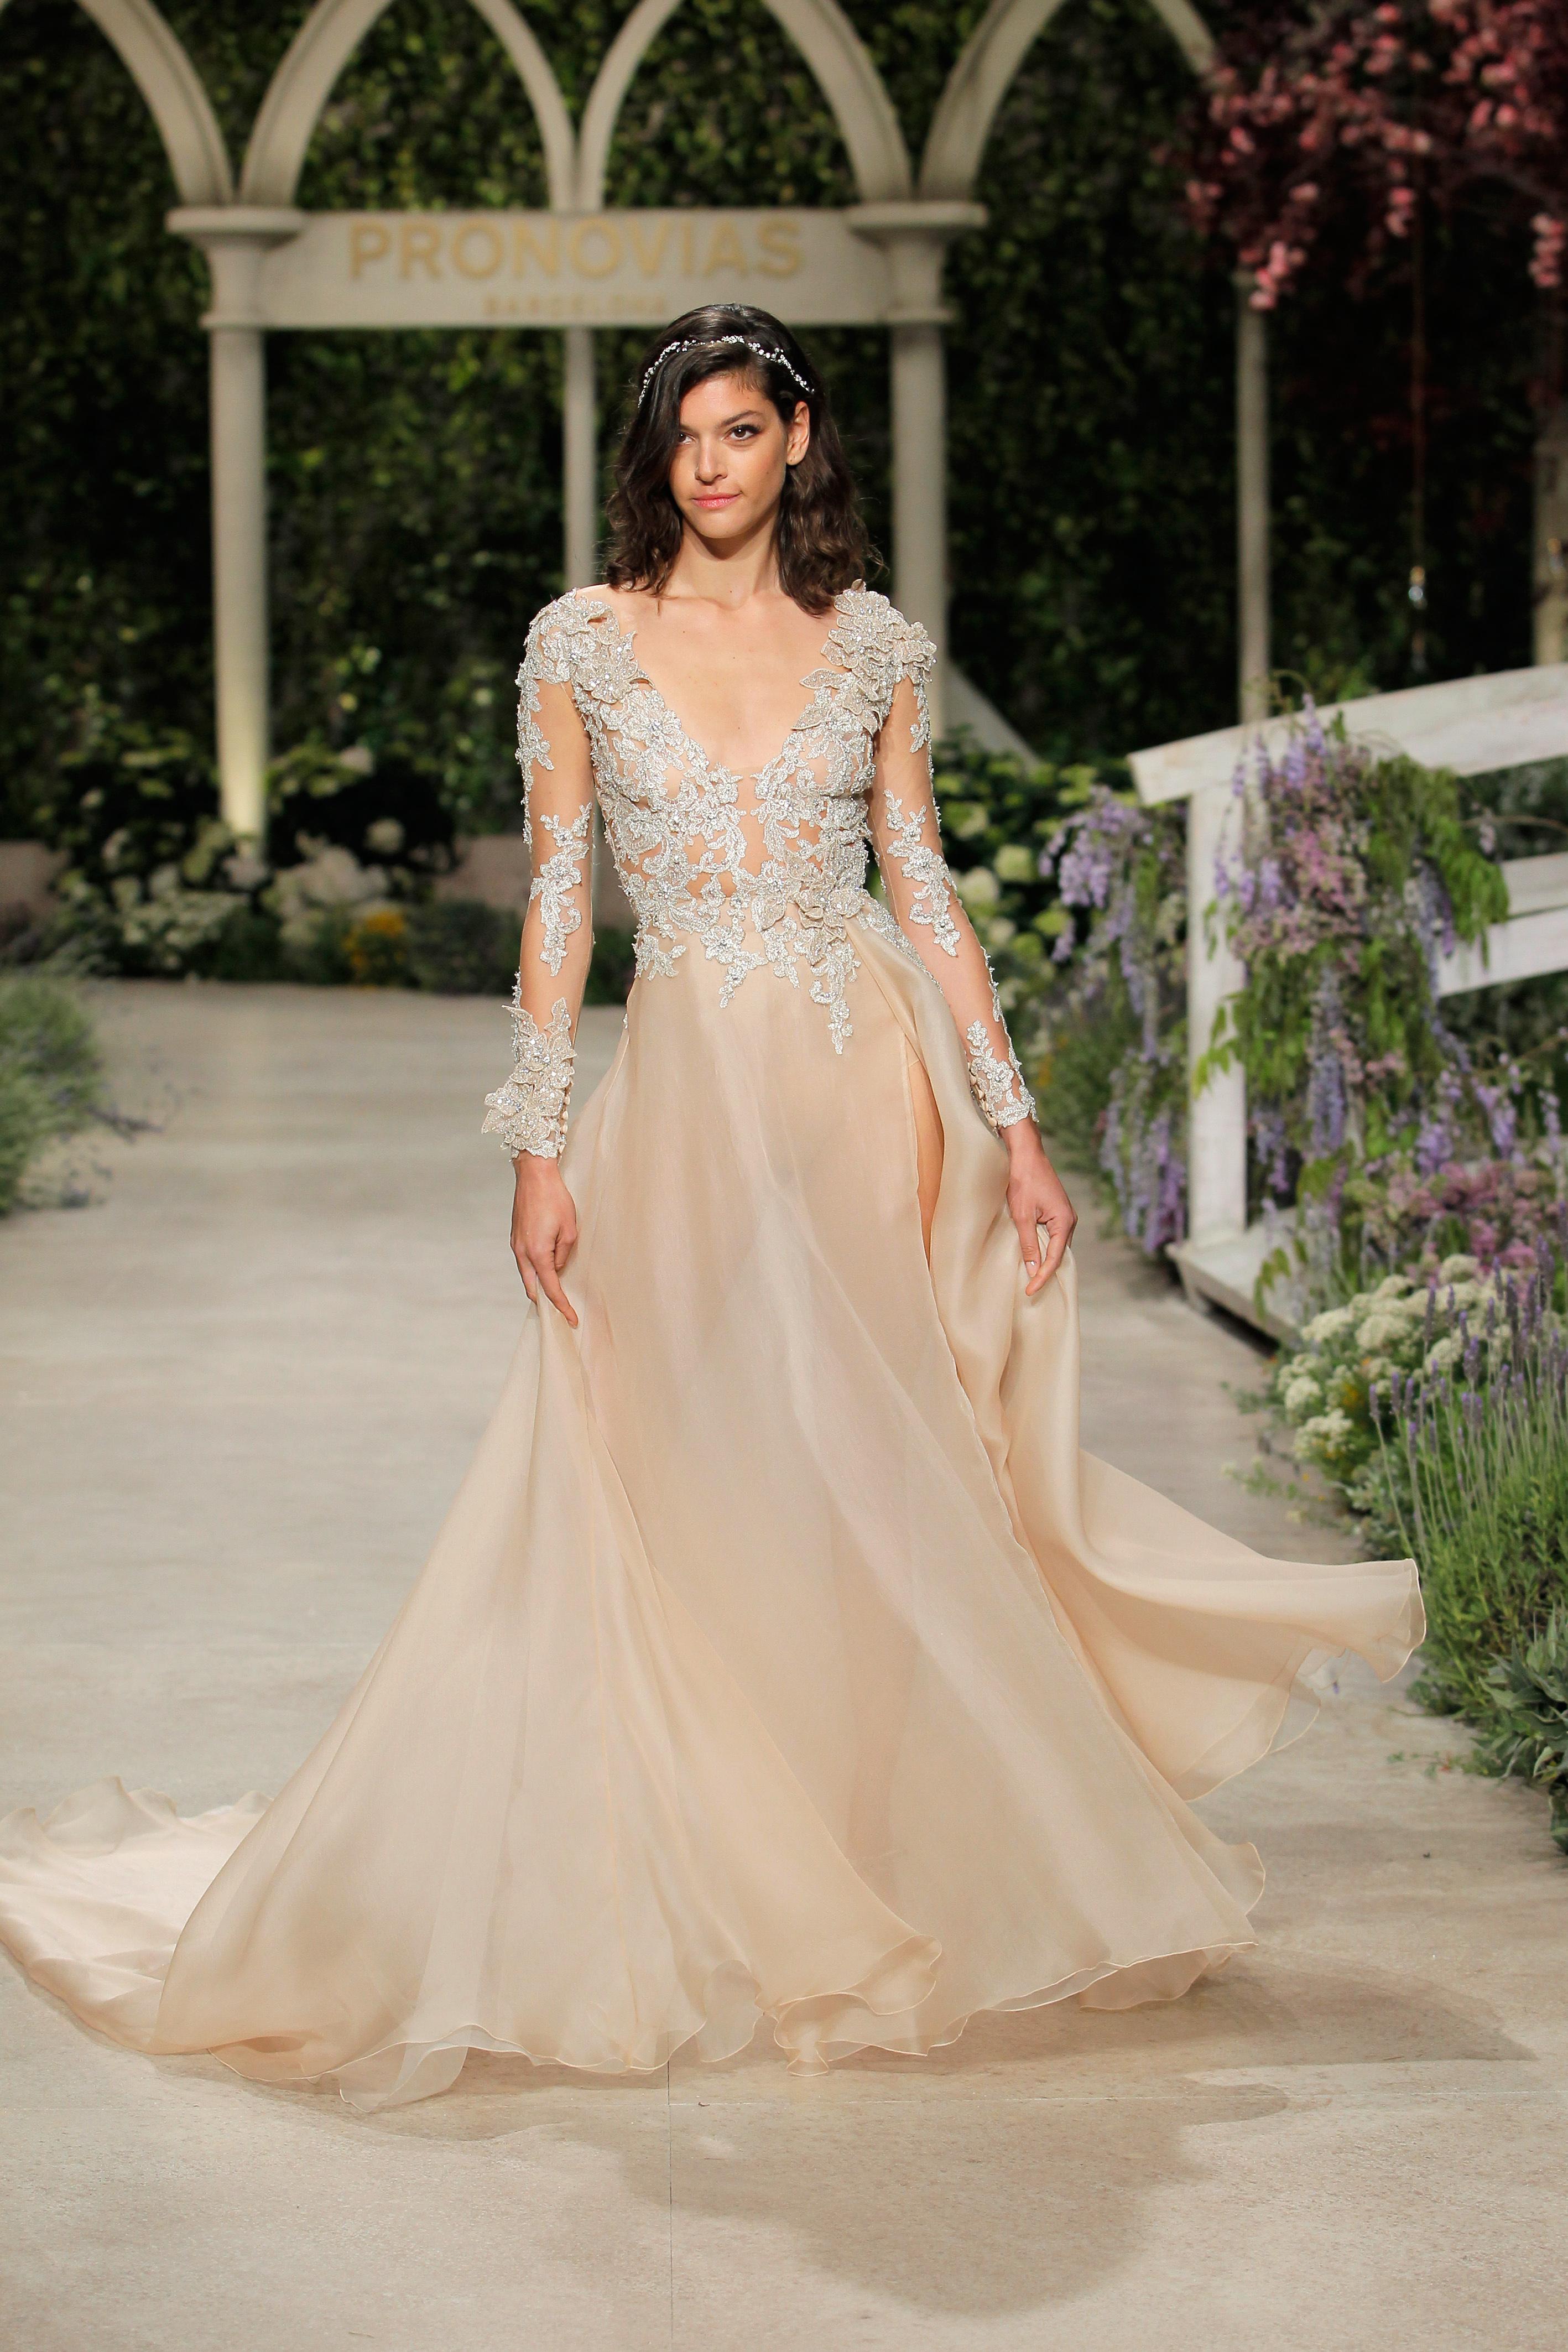 pronovias wedding dress spring 2019 peach embroidered long sleeve